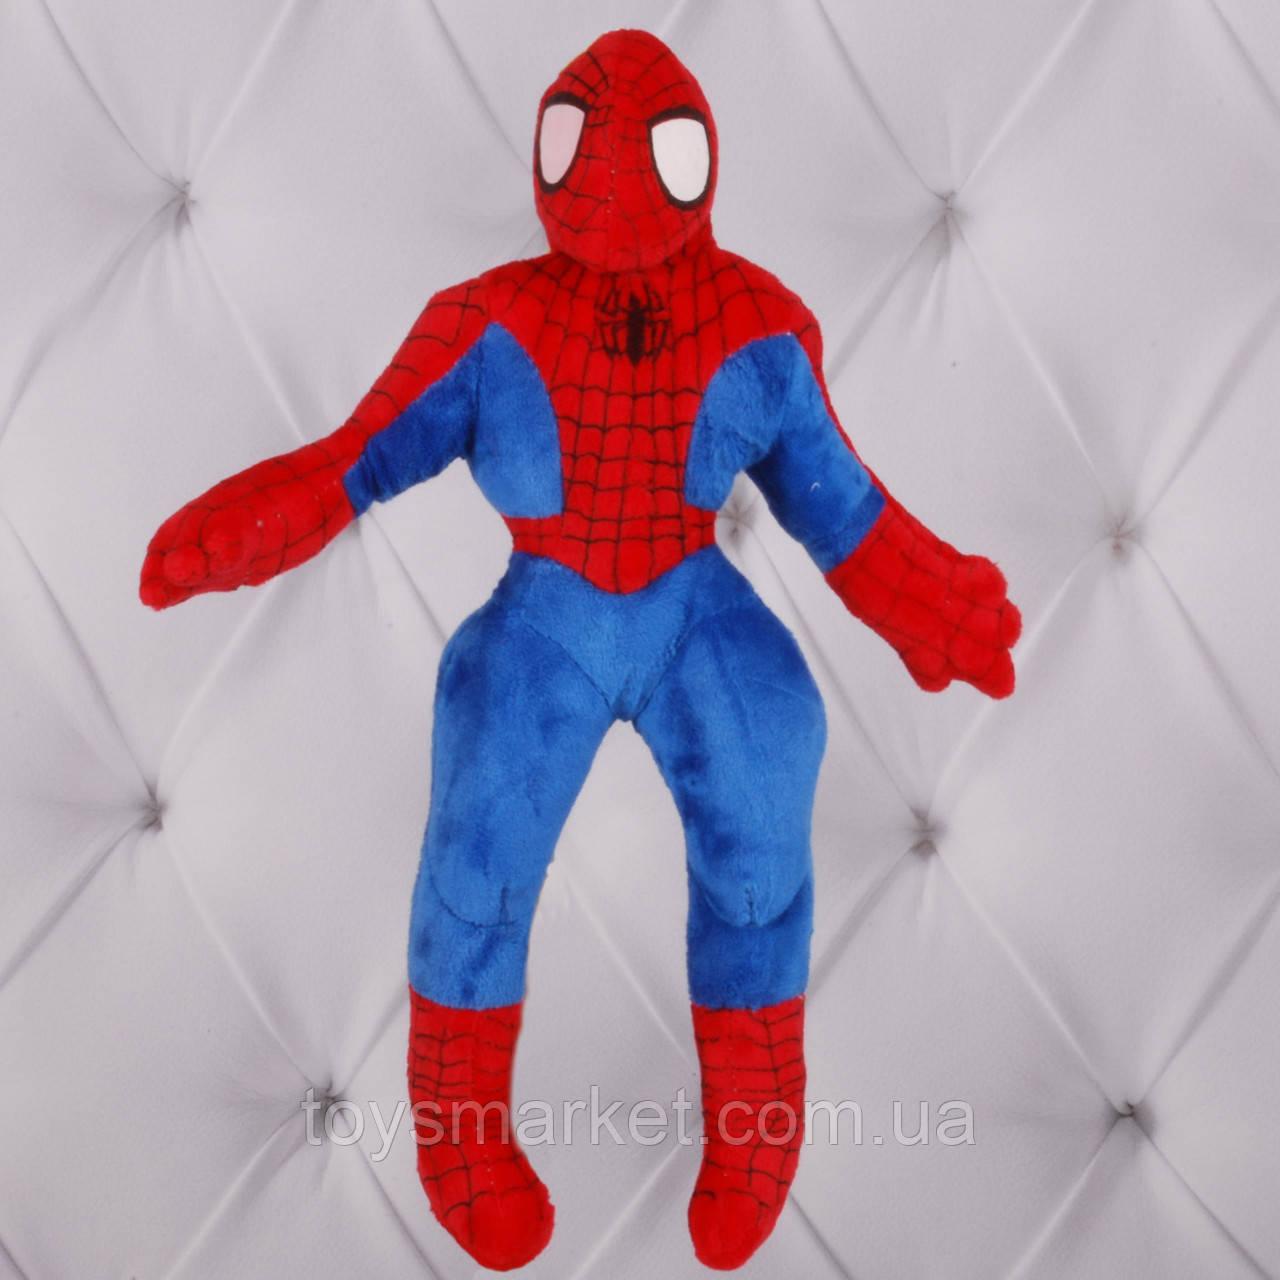 "Мягкая игрушка Человек паук, Spiderman, Спайдермен, плюшевая игрушка ""Spider-Man"""